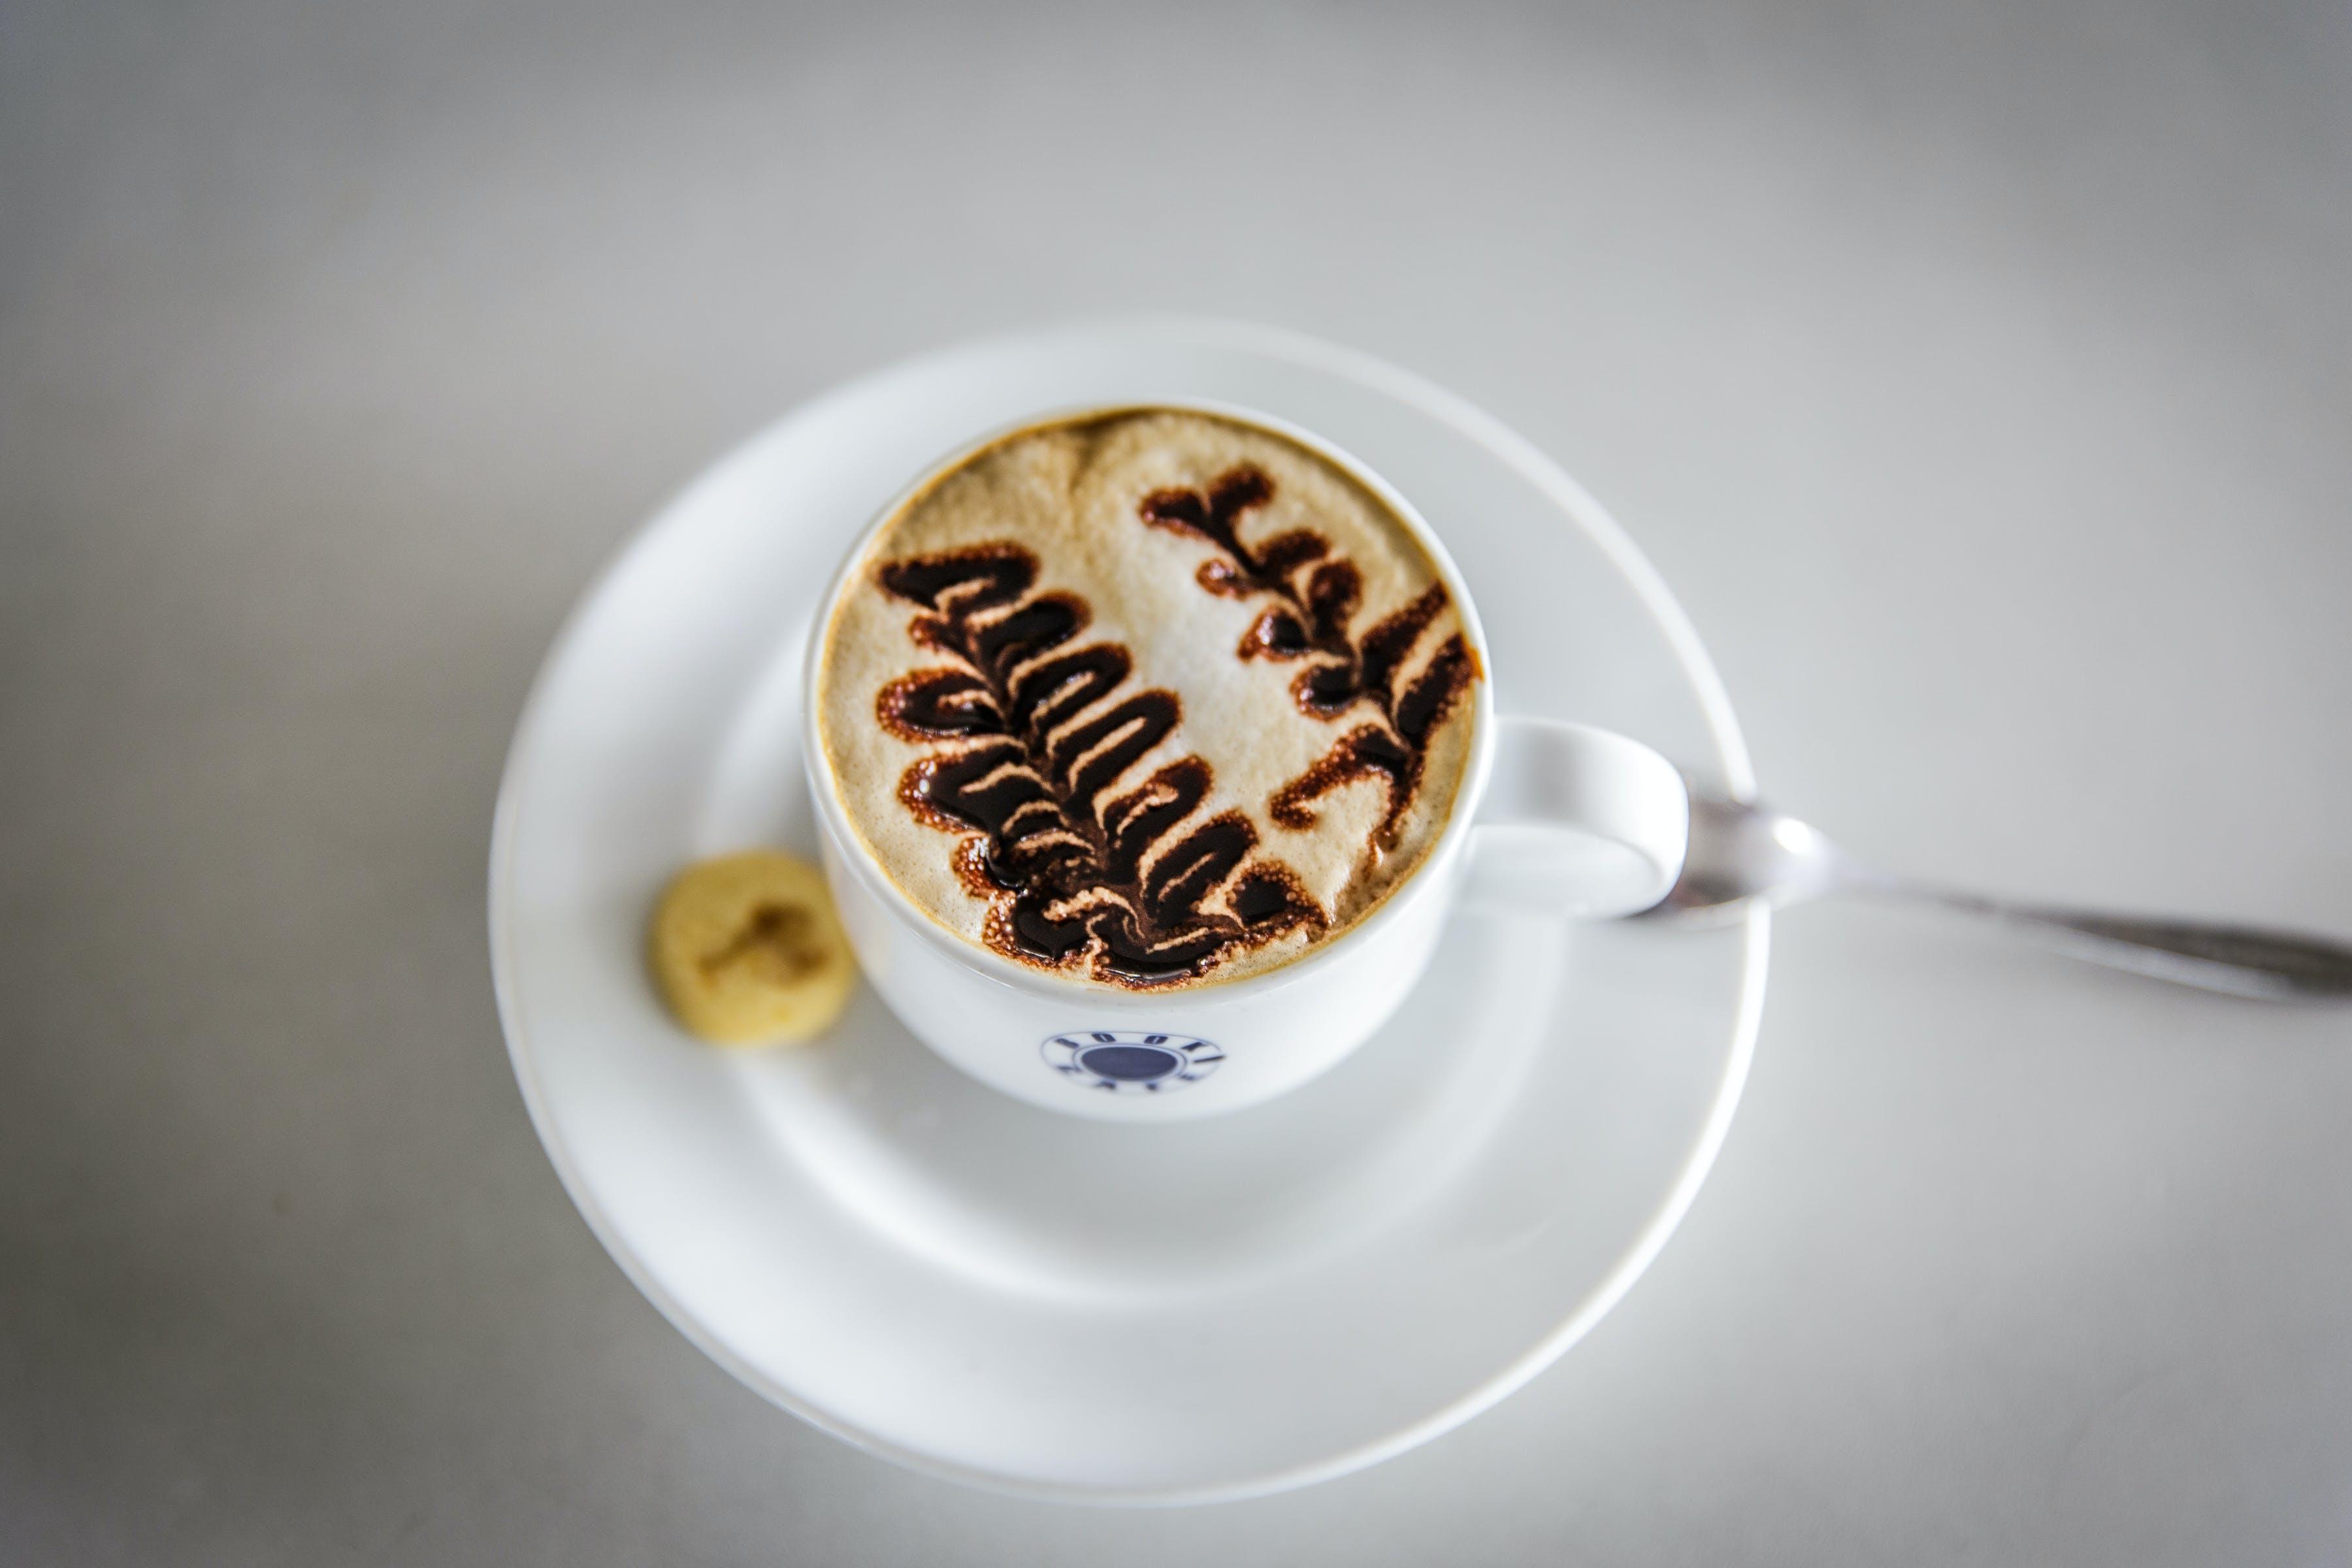 Kostenloses Stock Foto zu cappuccino, espresso, kaffee, kaffeebecher